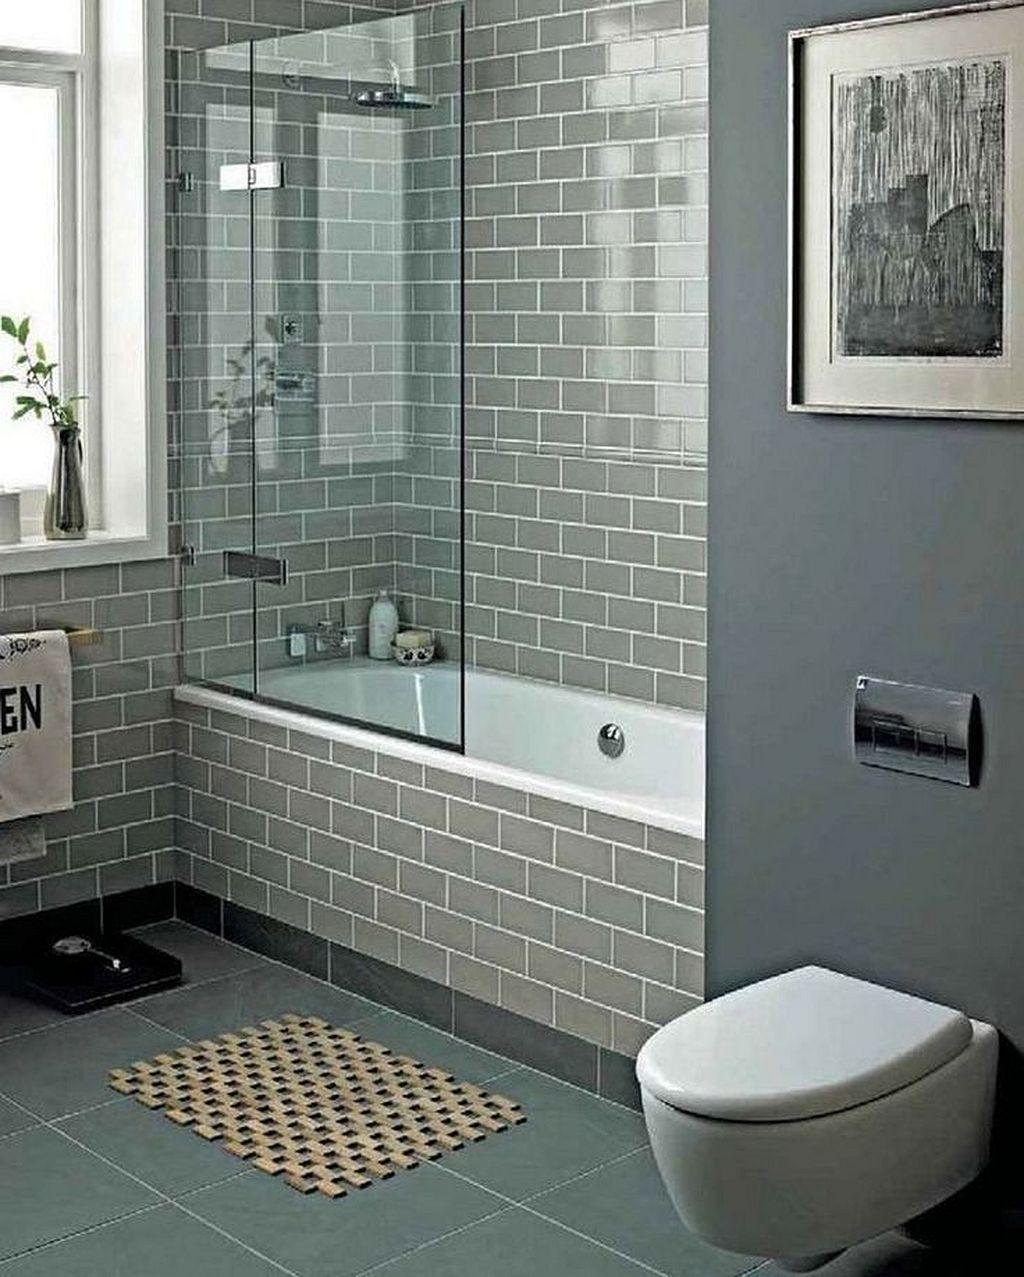 Tiny Bathroom Tub Shower Combo Remodeling Ideas 53 #remodelingideas ...